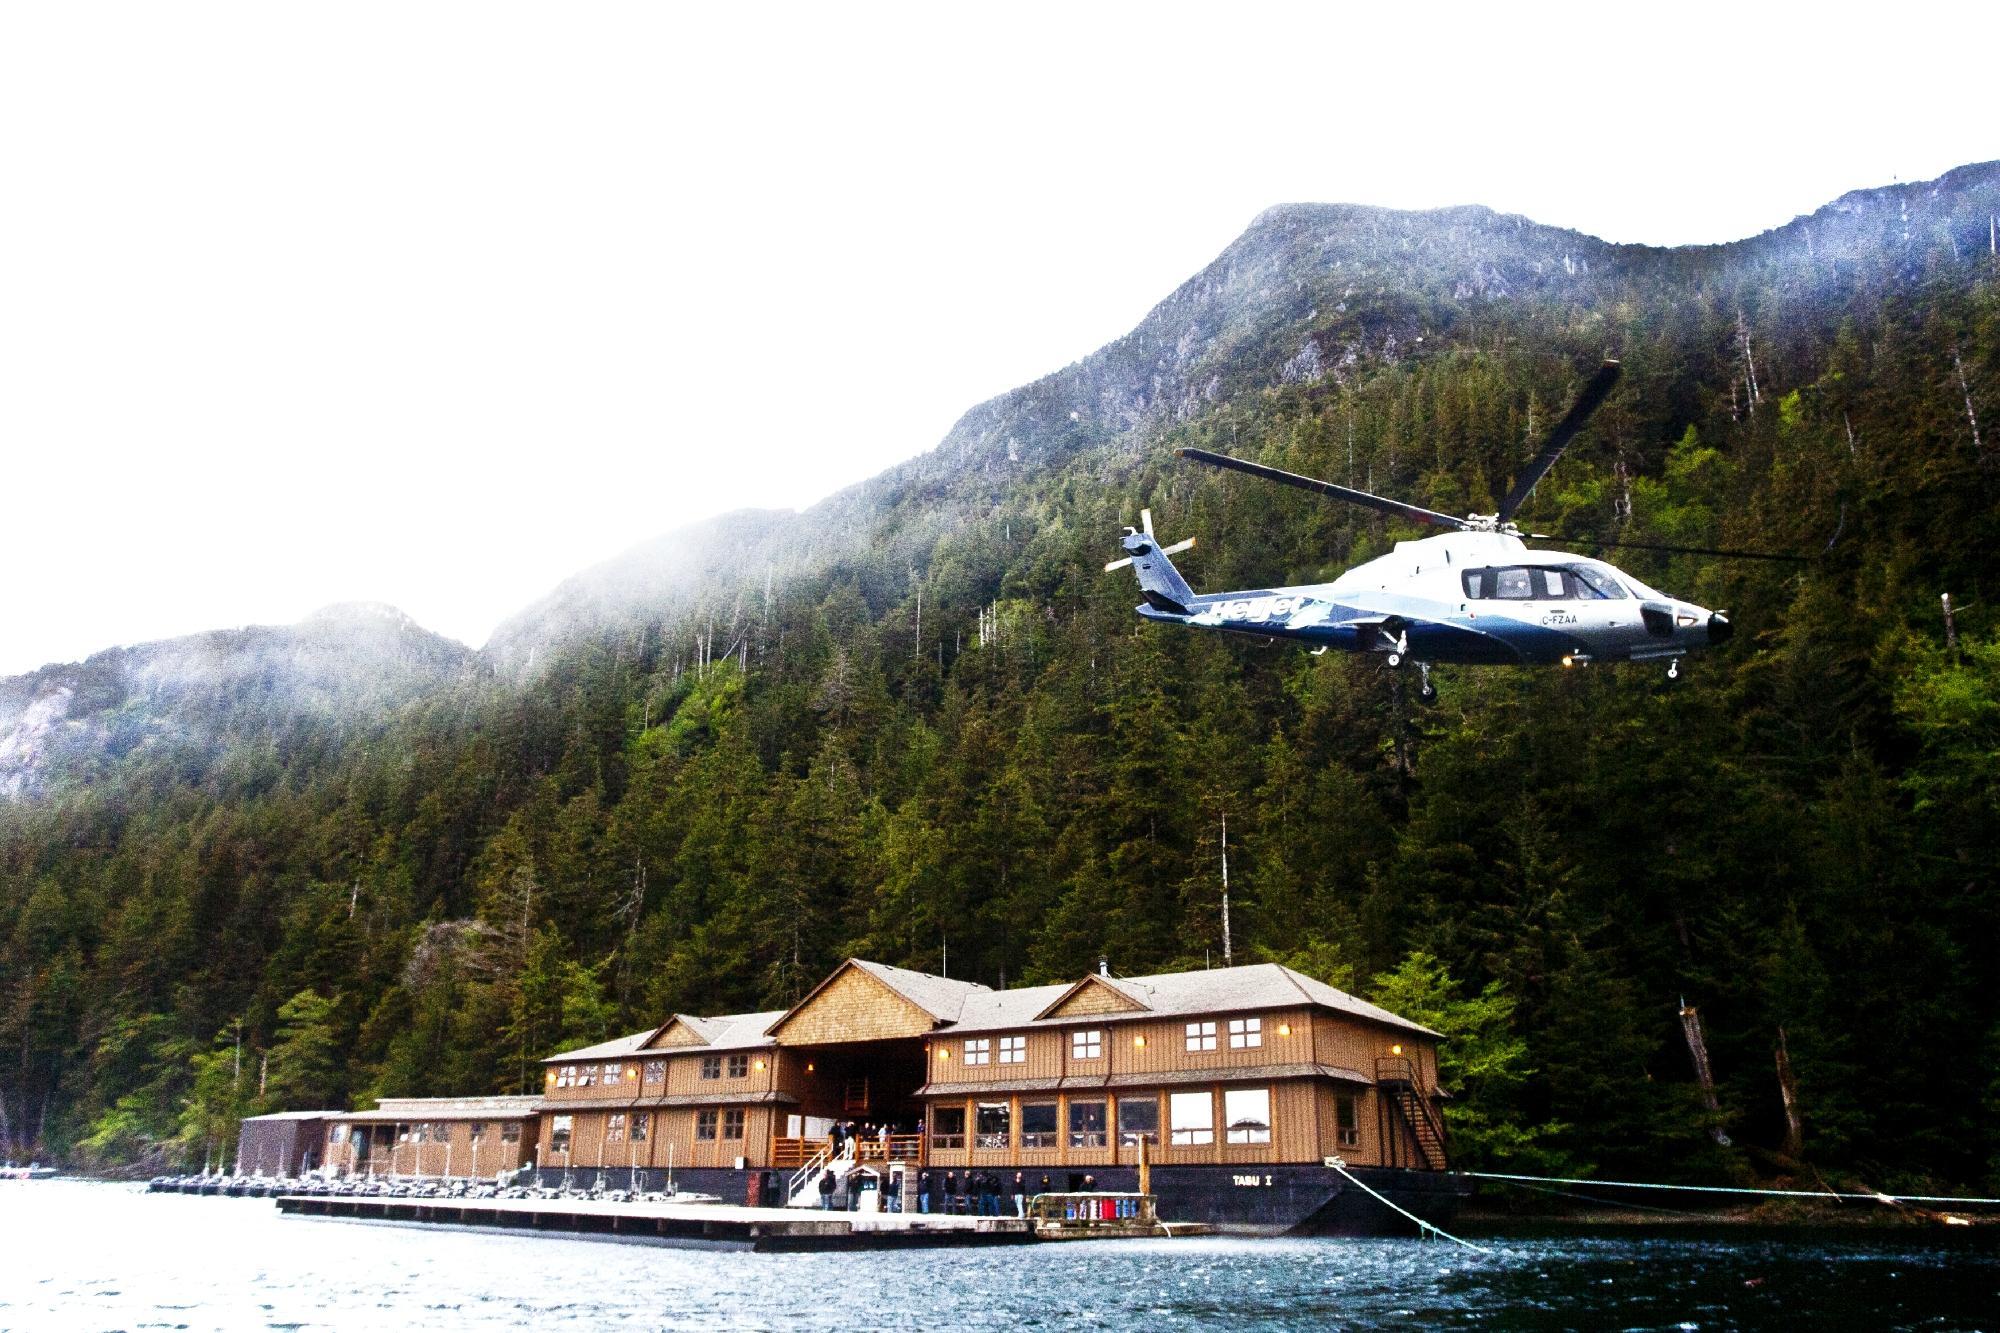 The Lodge on Hippa Island